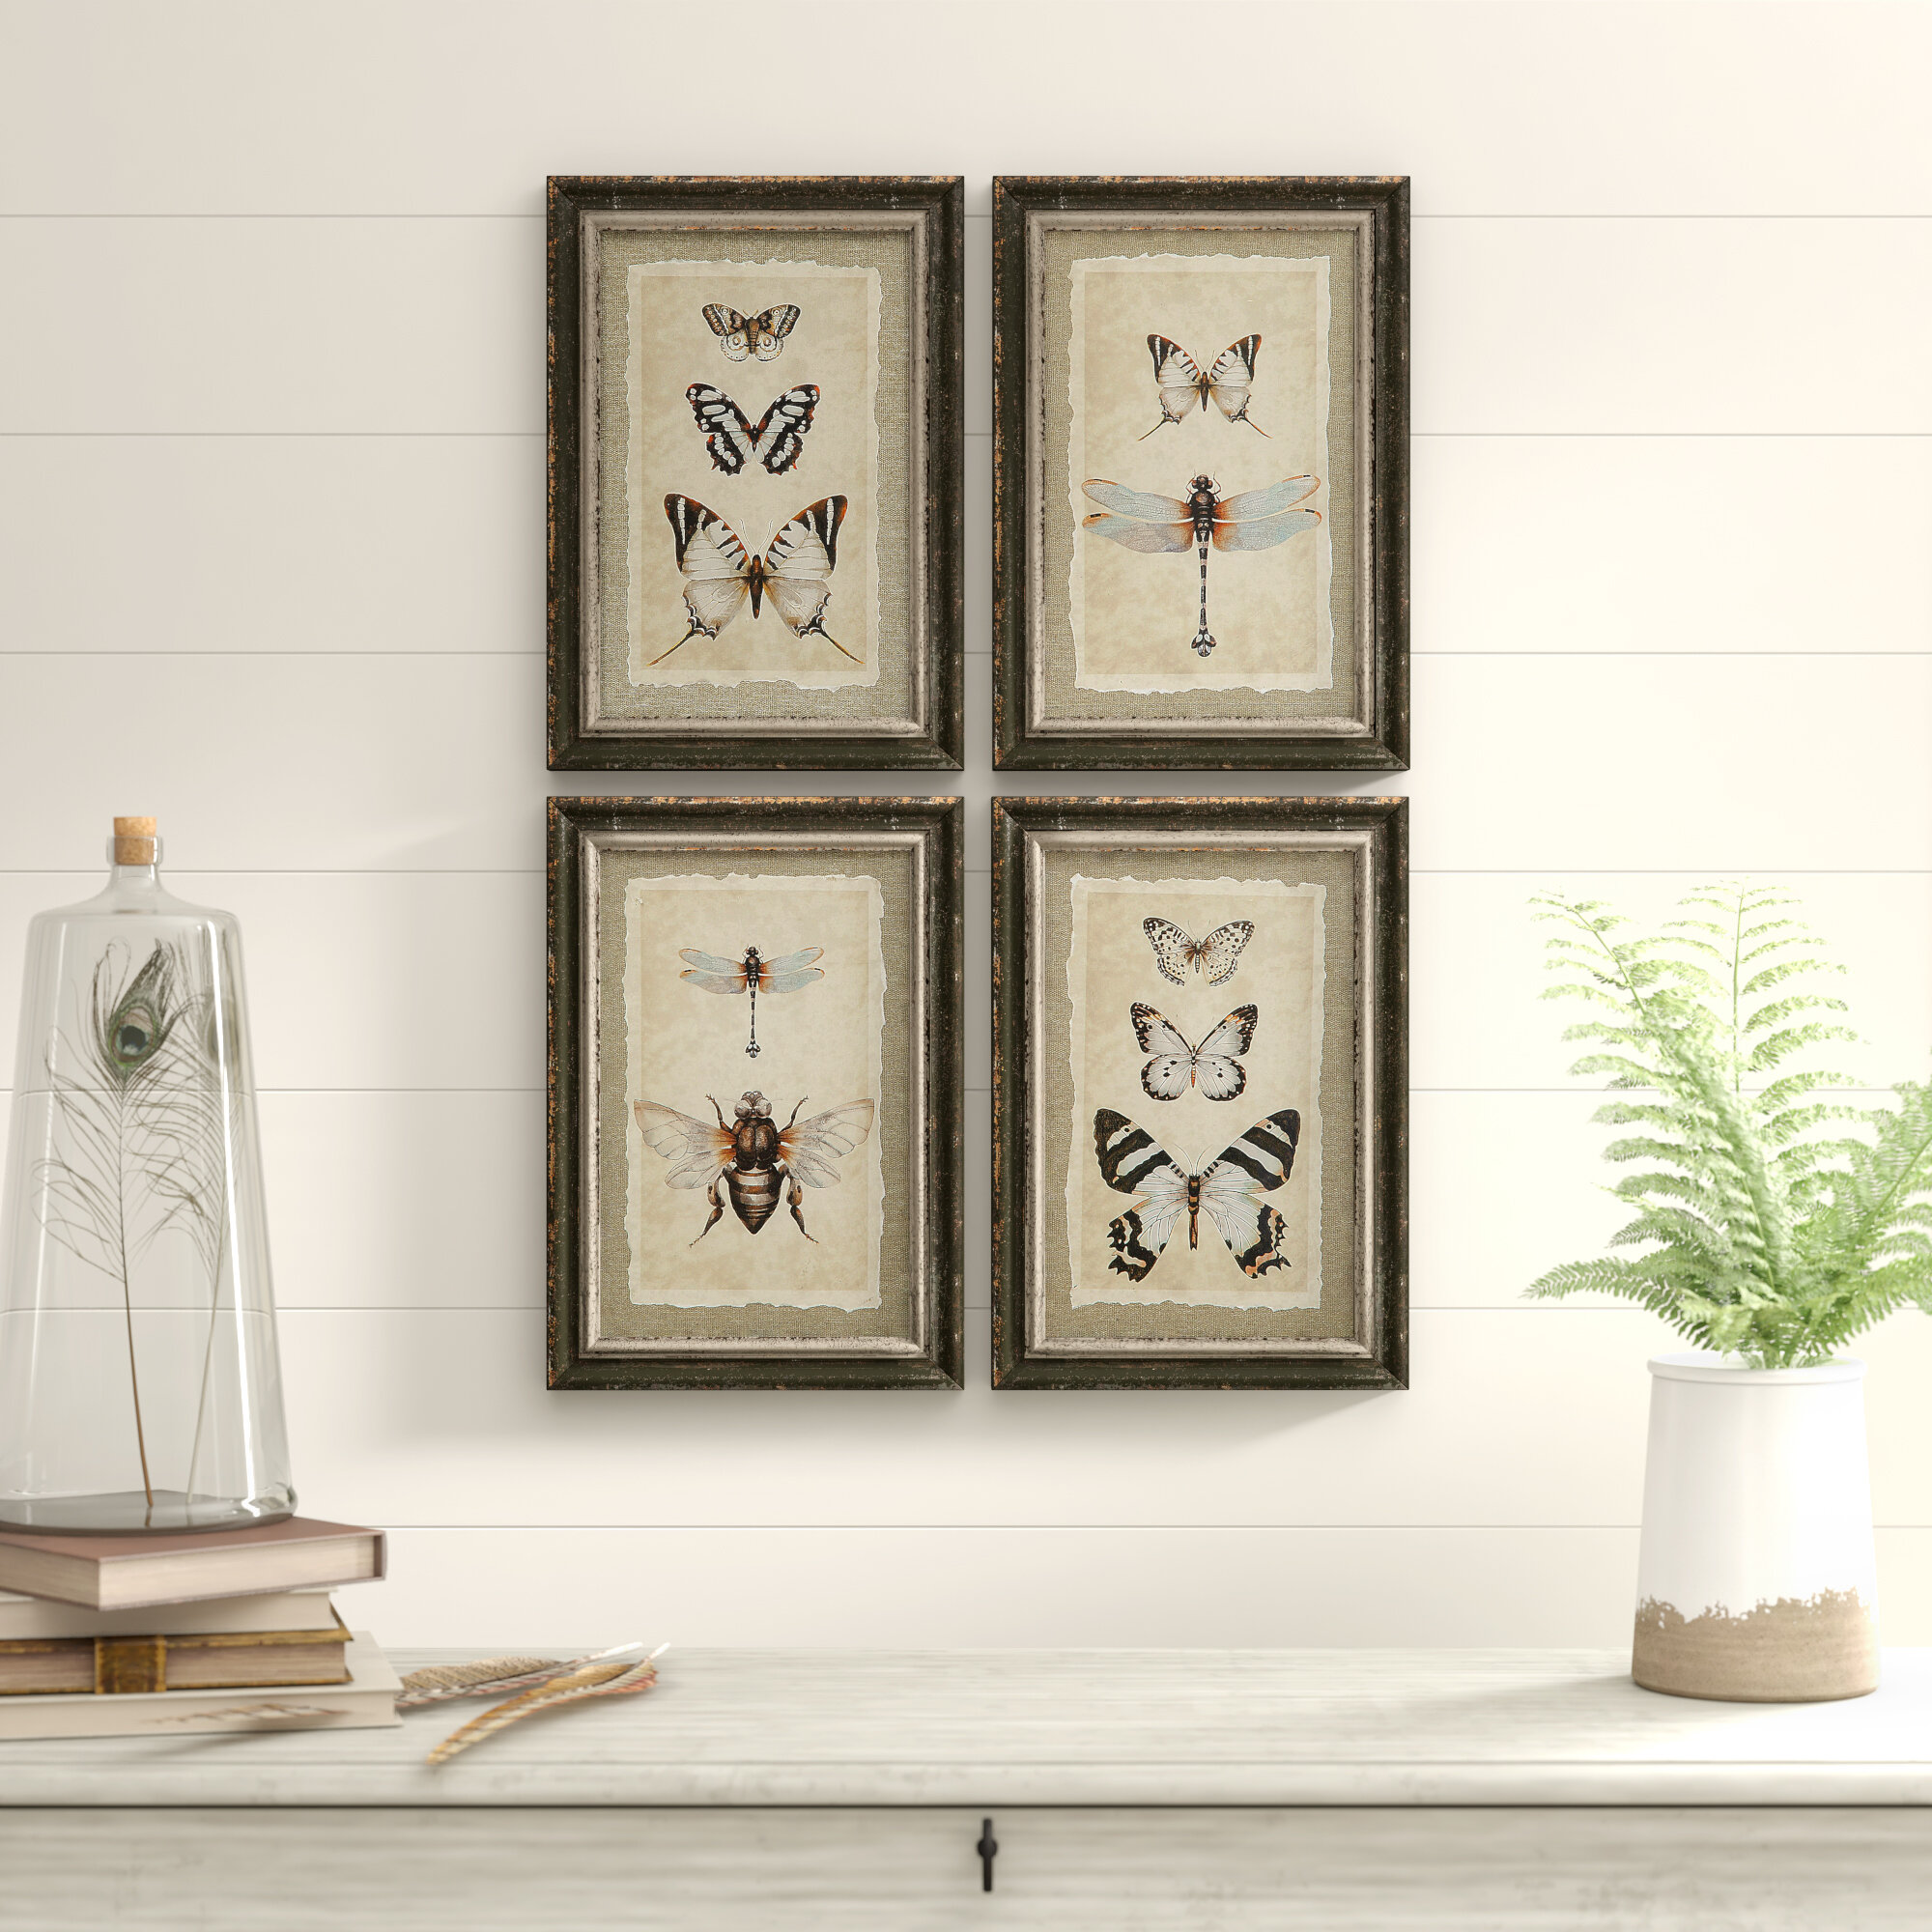 Birch Lane Wood Framed Vintage Insect Prints 4 Piece Picture Frame Print Set On Wood Reviews Wayfair